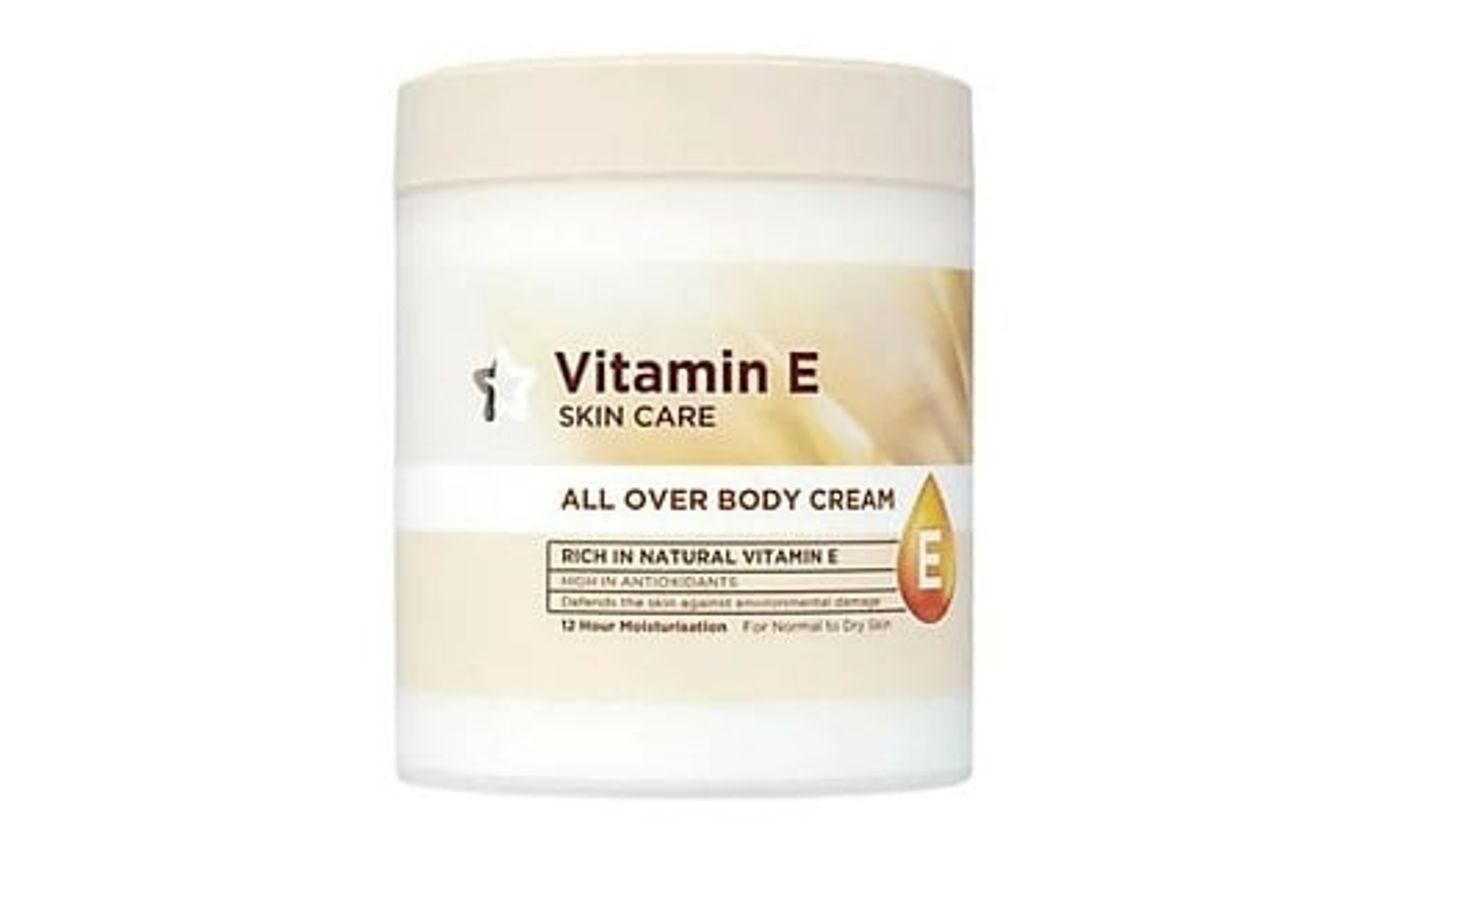 Kem Dưỡng Thể Superdrugs Vitamin E Body Cream 475ml Của Anh